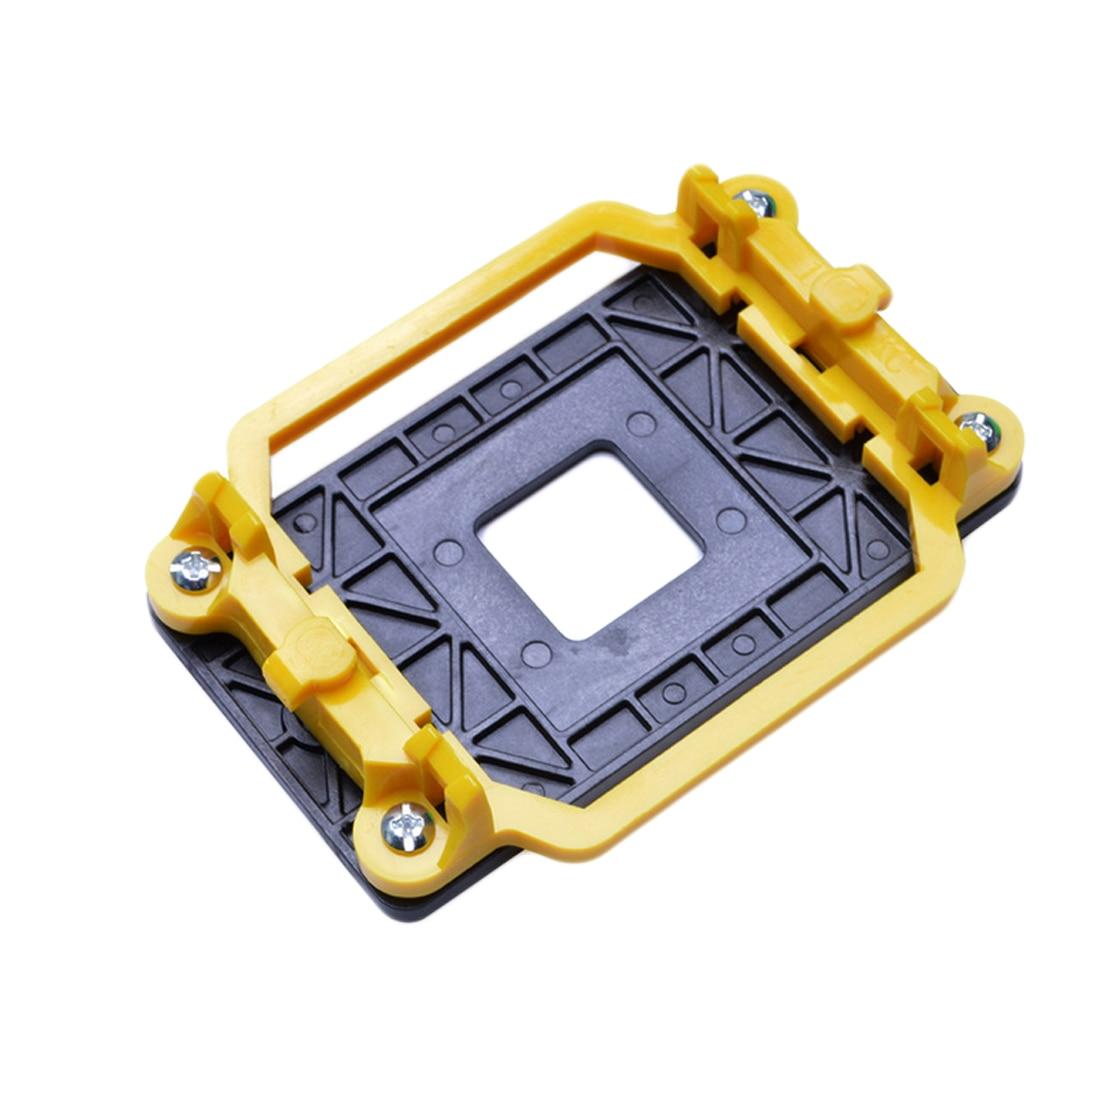 Etmakit Good Sale CPU Cooler Bracket Motherboard for AMD AM2/AM2+/AM3/AM3+/FM1/FM2/FM2+/940/939 Install the fastening 2200rpm cpu quiet fan cooler cooling heatsink for intel lga775 1155 amd am2 3 l059 new hot